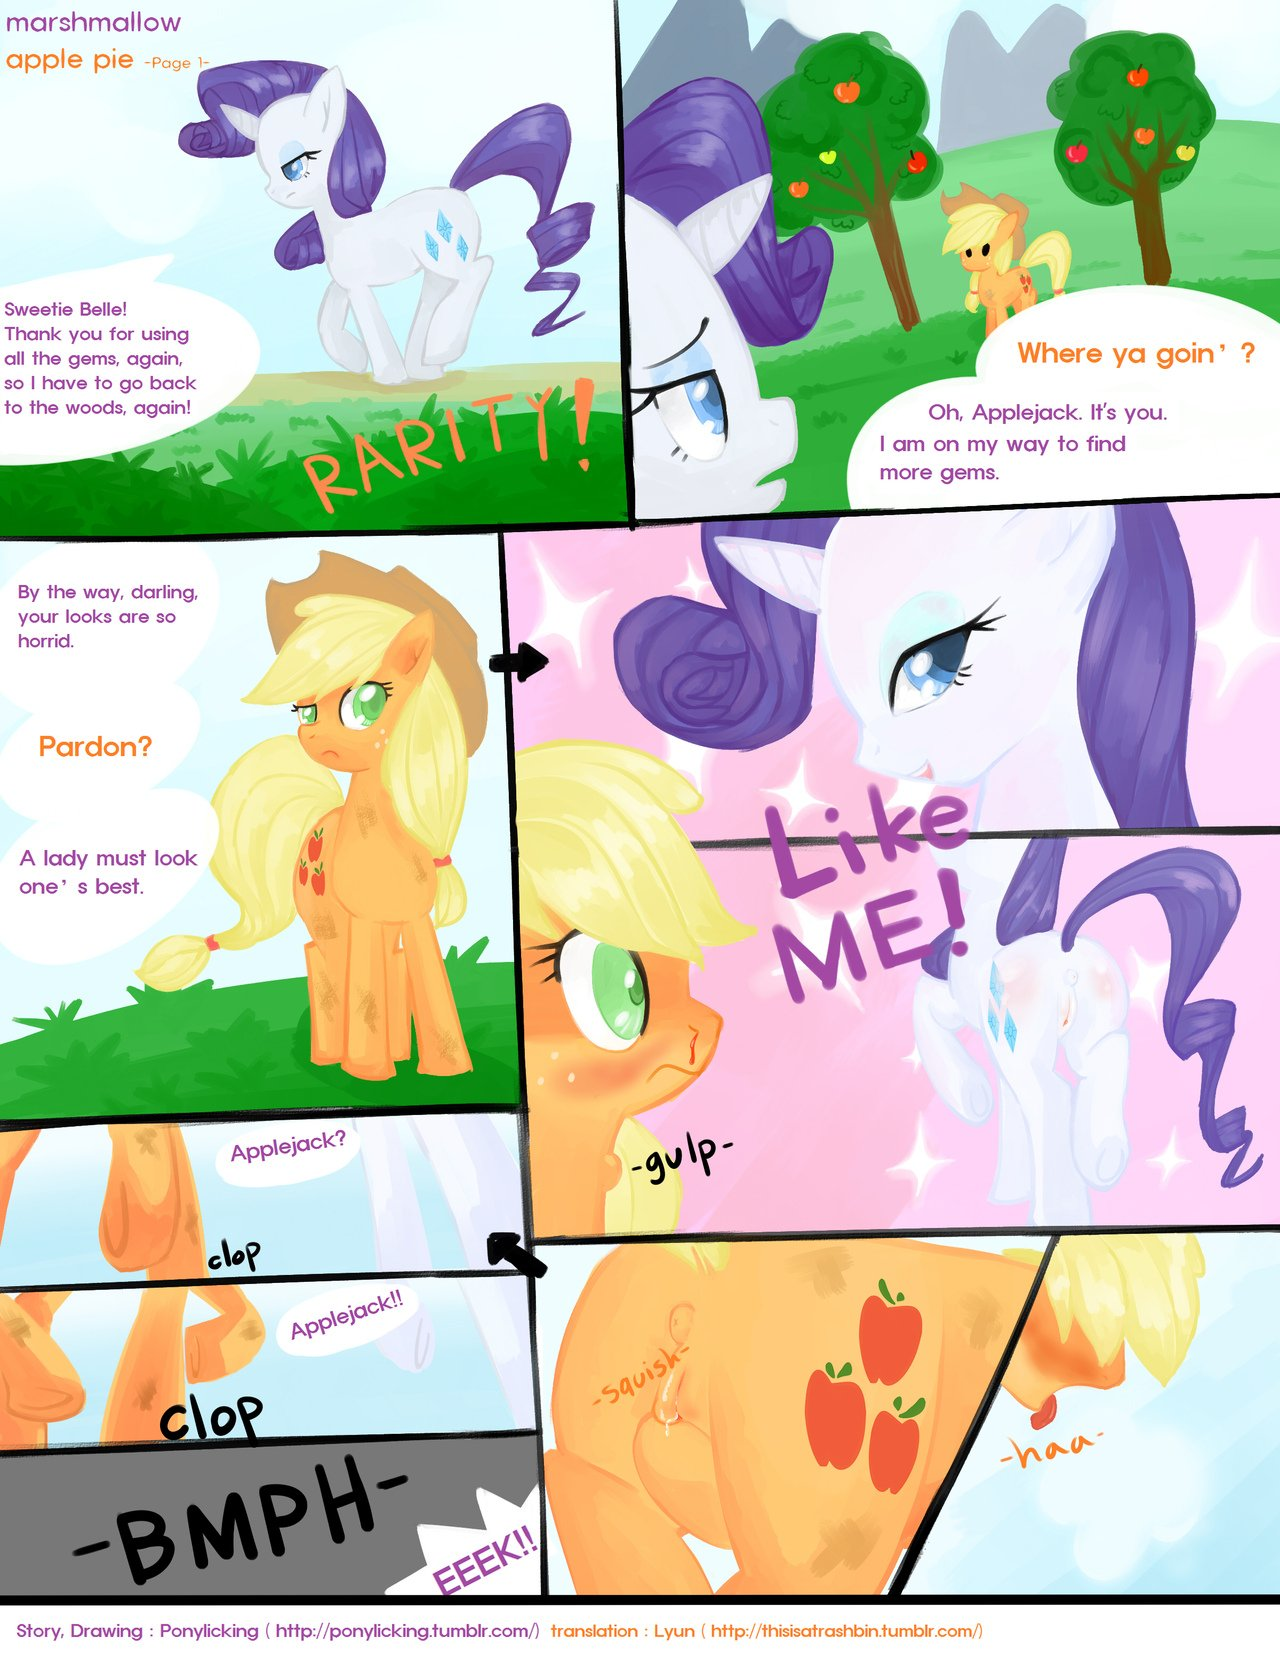 Apple Pie Porn read [pony licking] marshmallow apple pie (my little pony